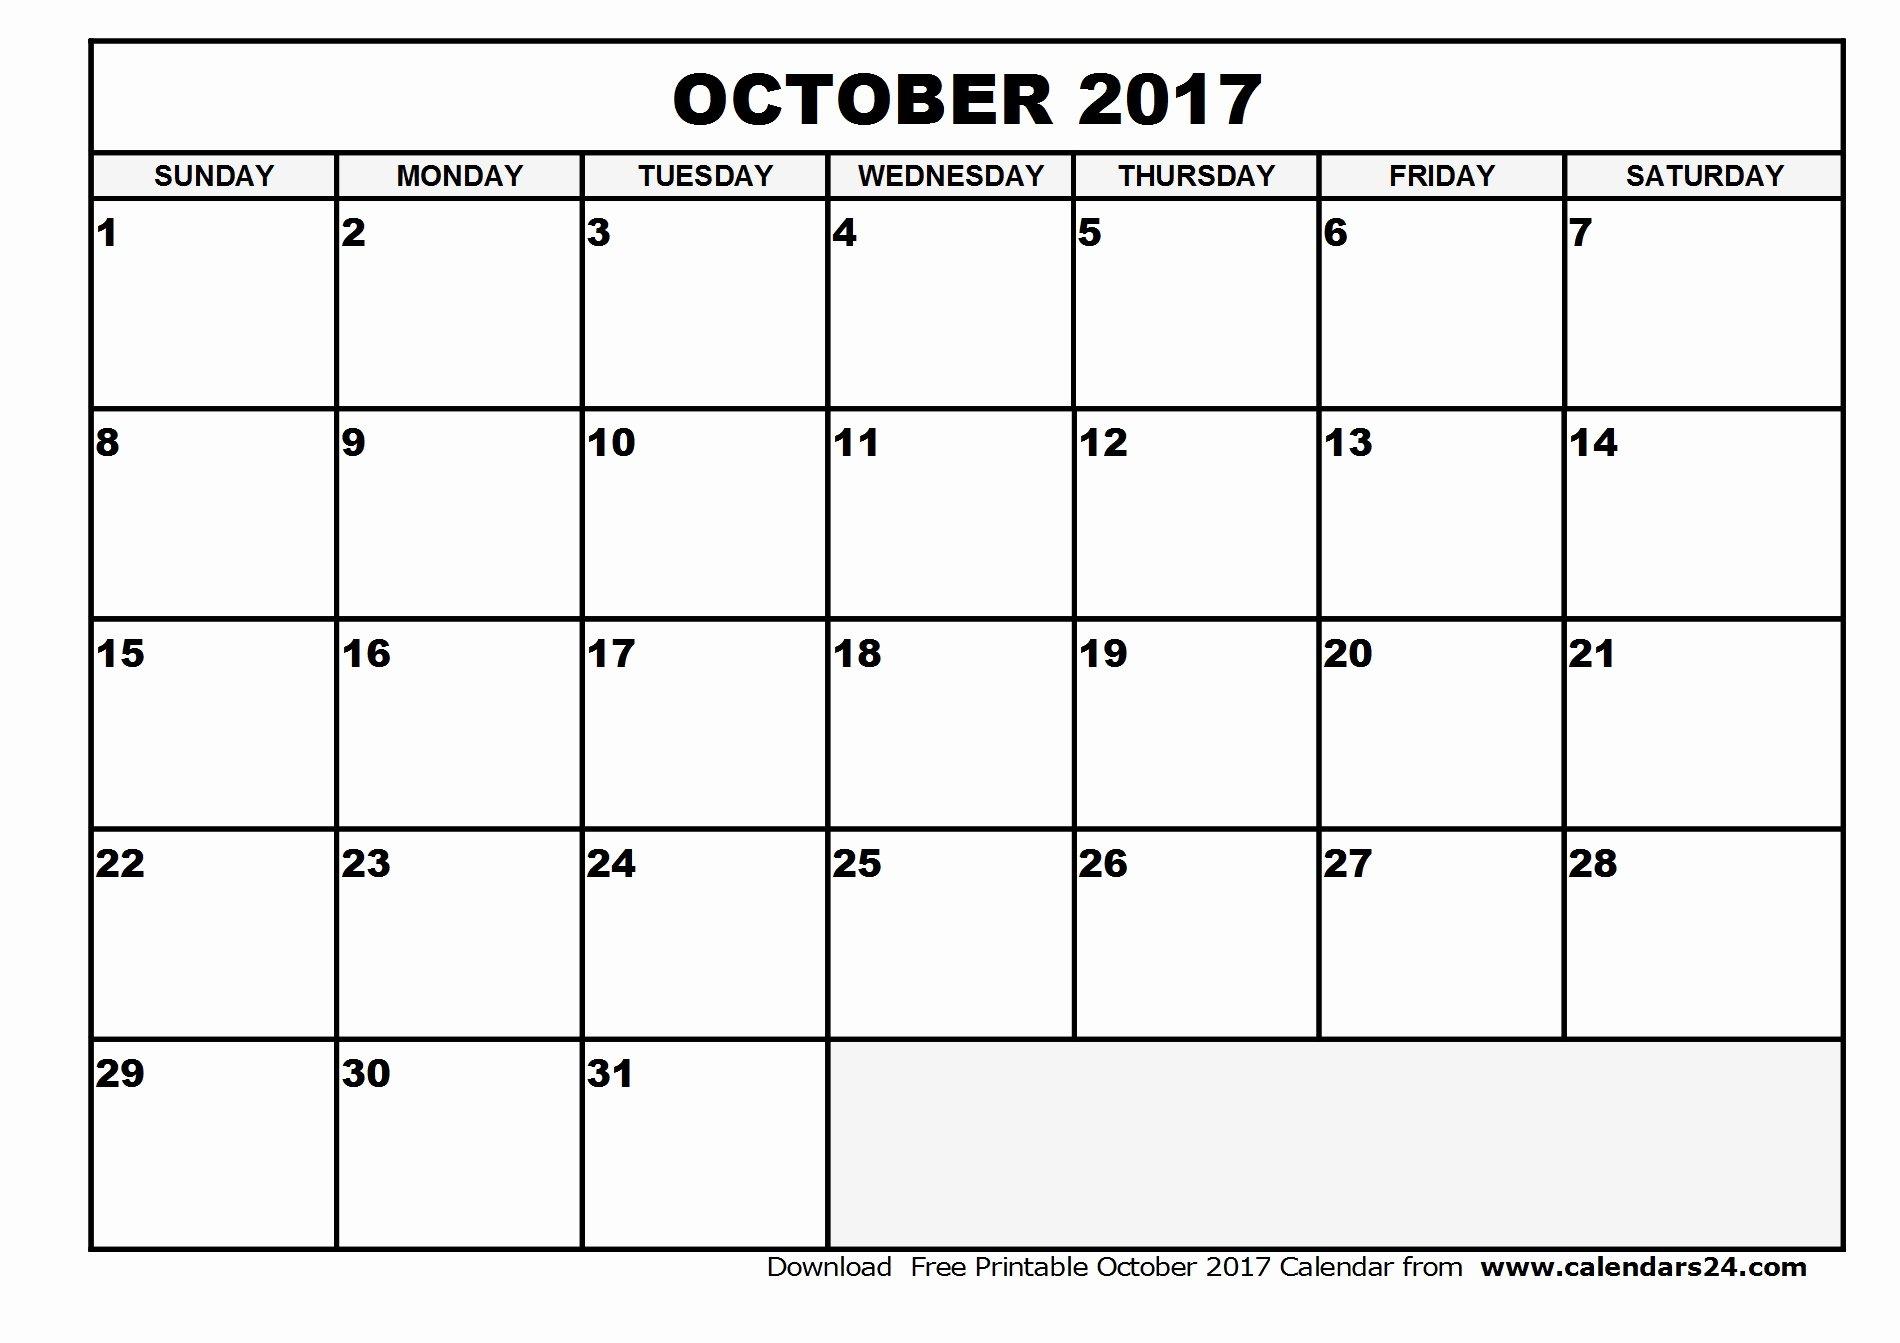 Blank October 2017 Calendar